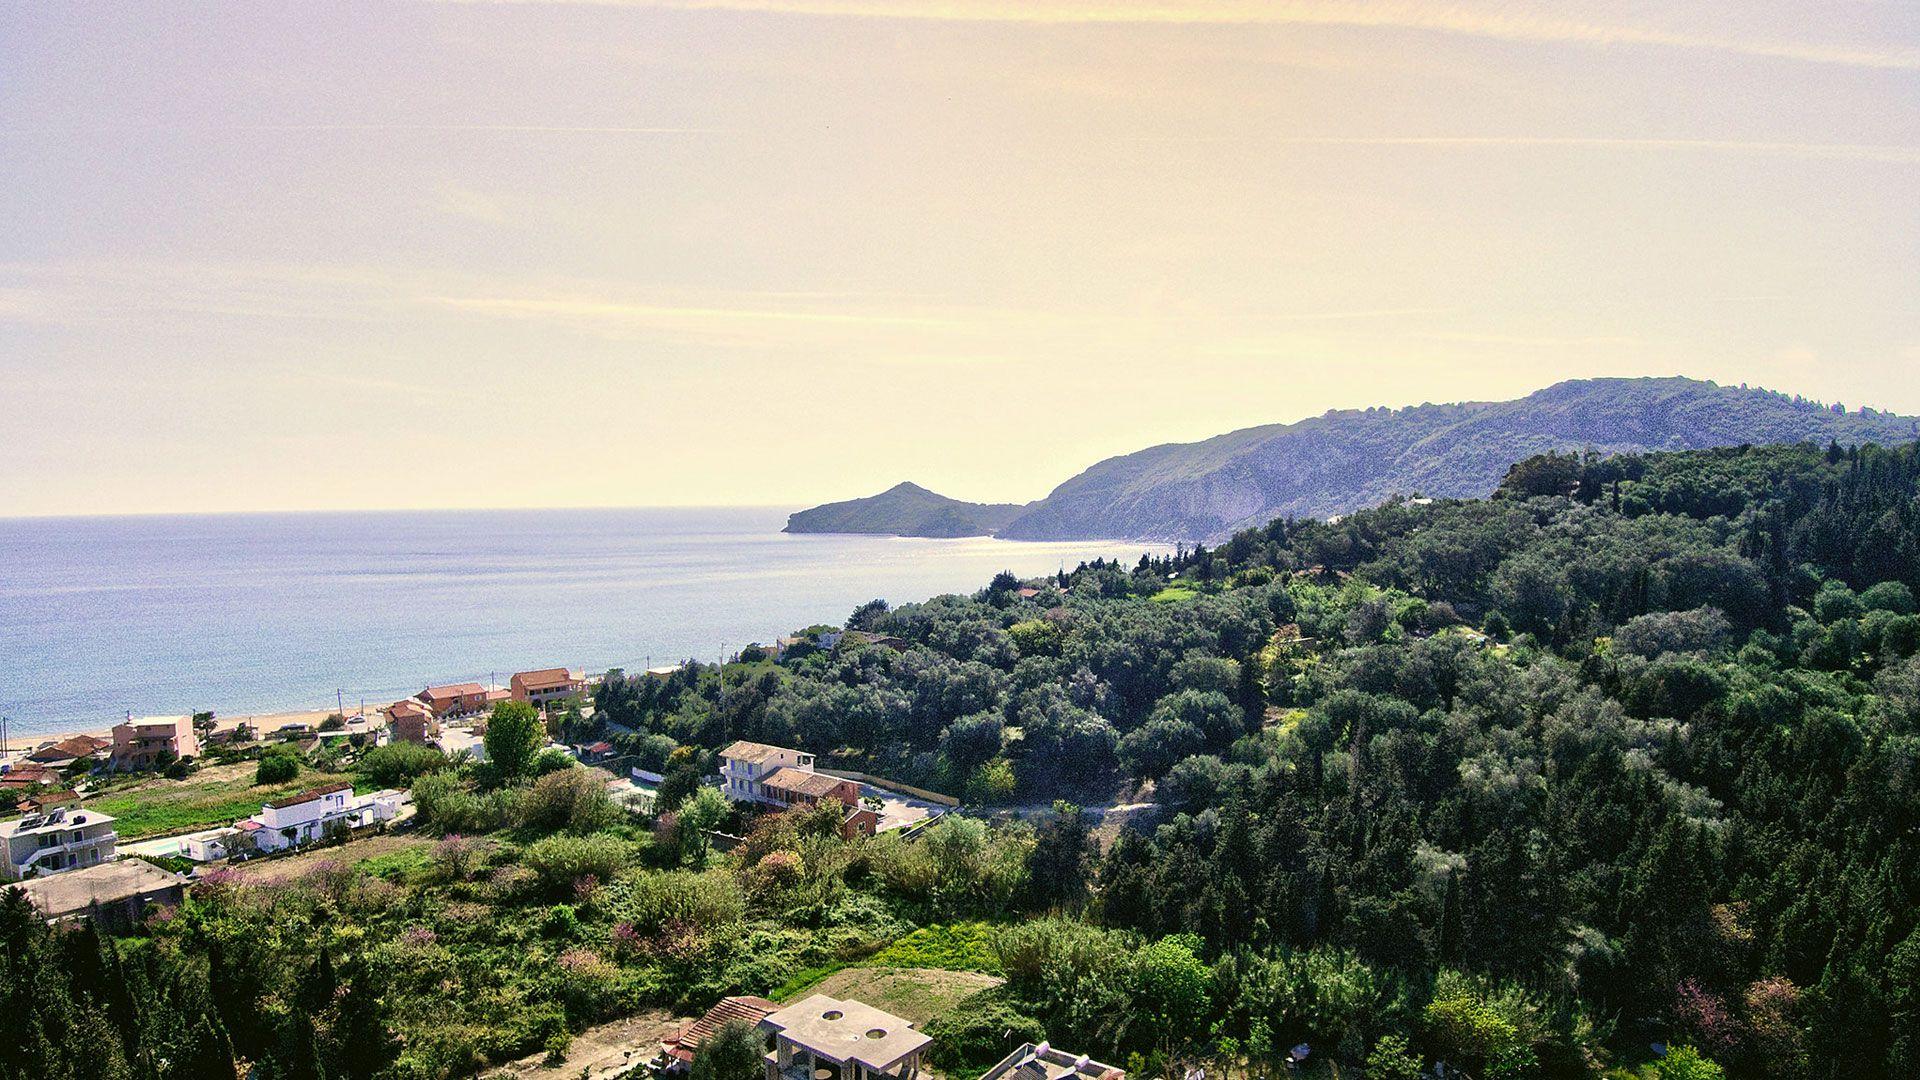 View of Agios Georgios bay